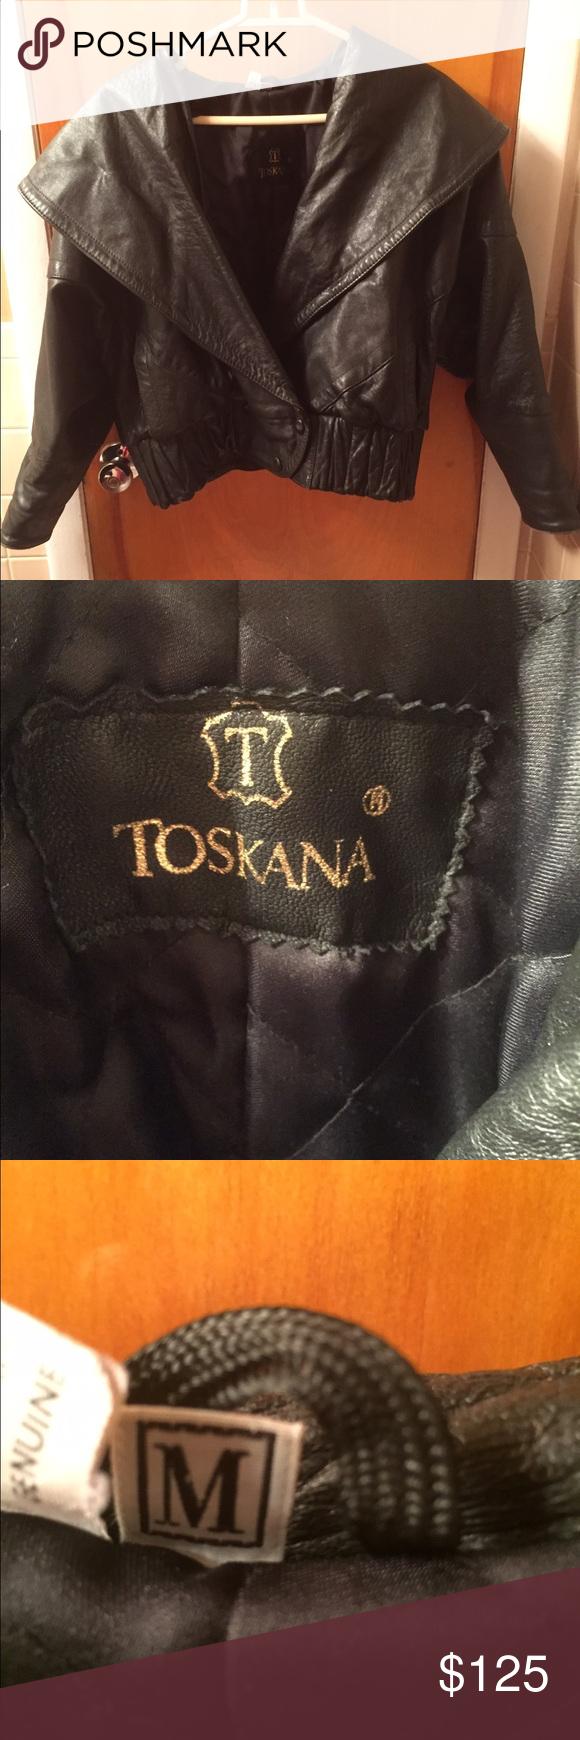 100 leather jacket. Made in Turkey. Sz.M. Ladies